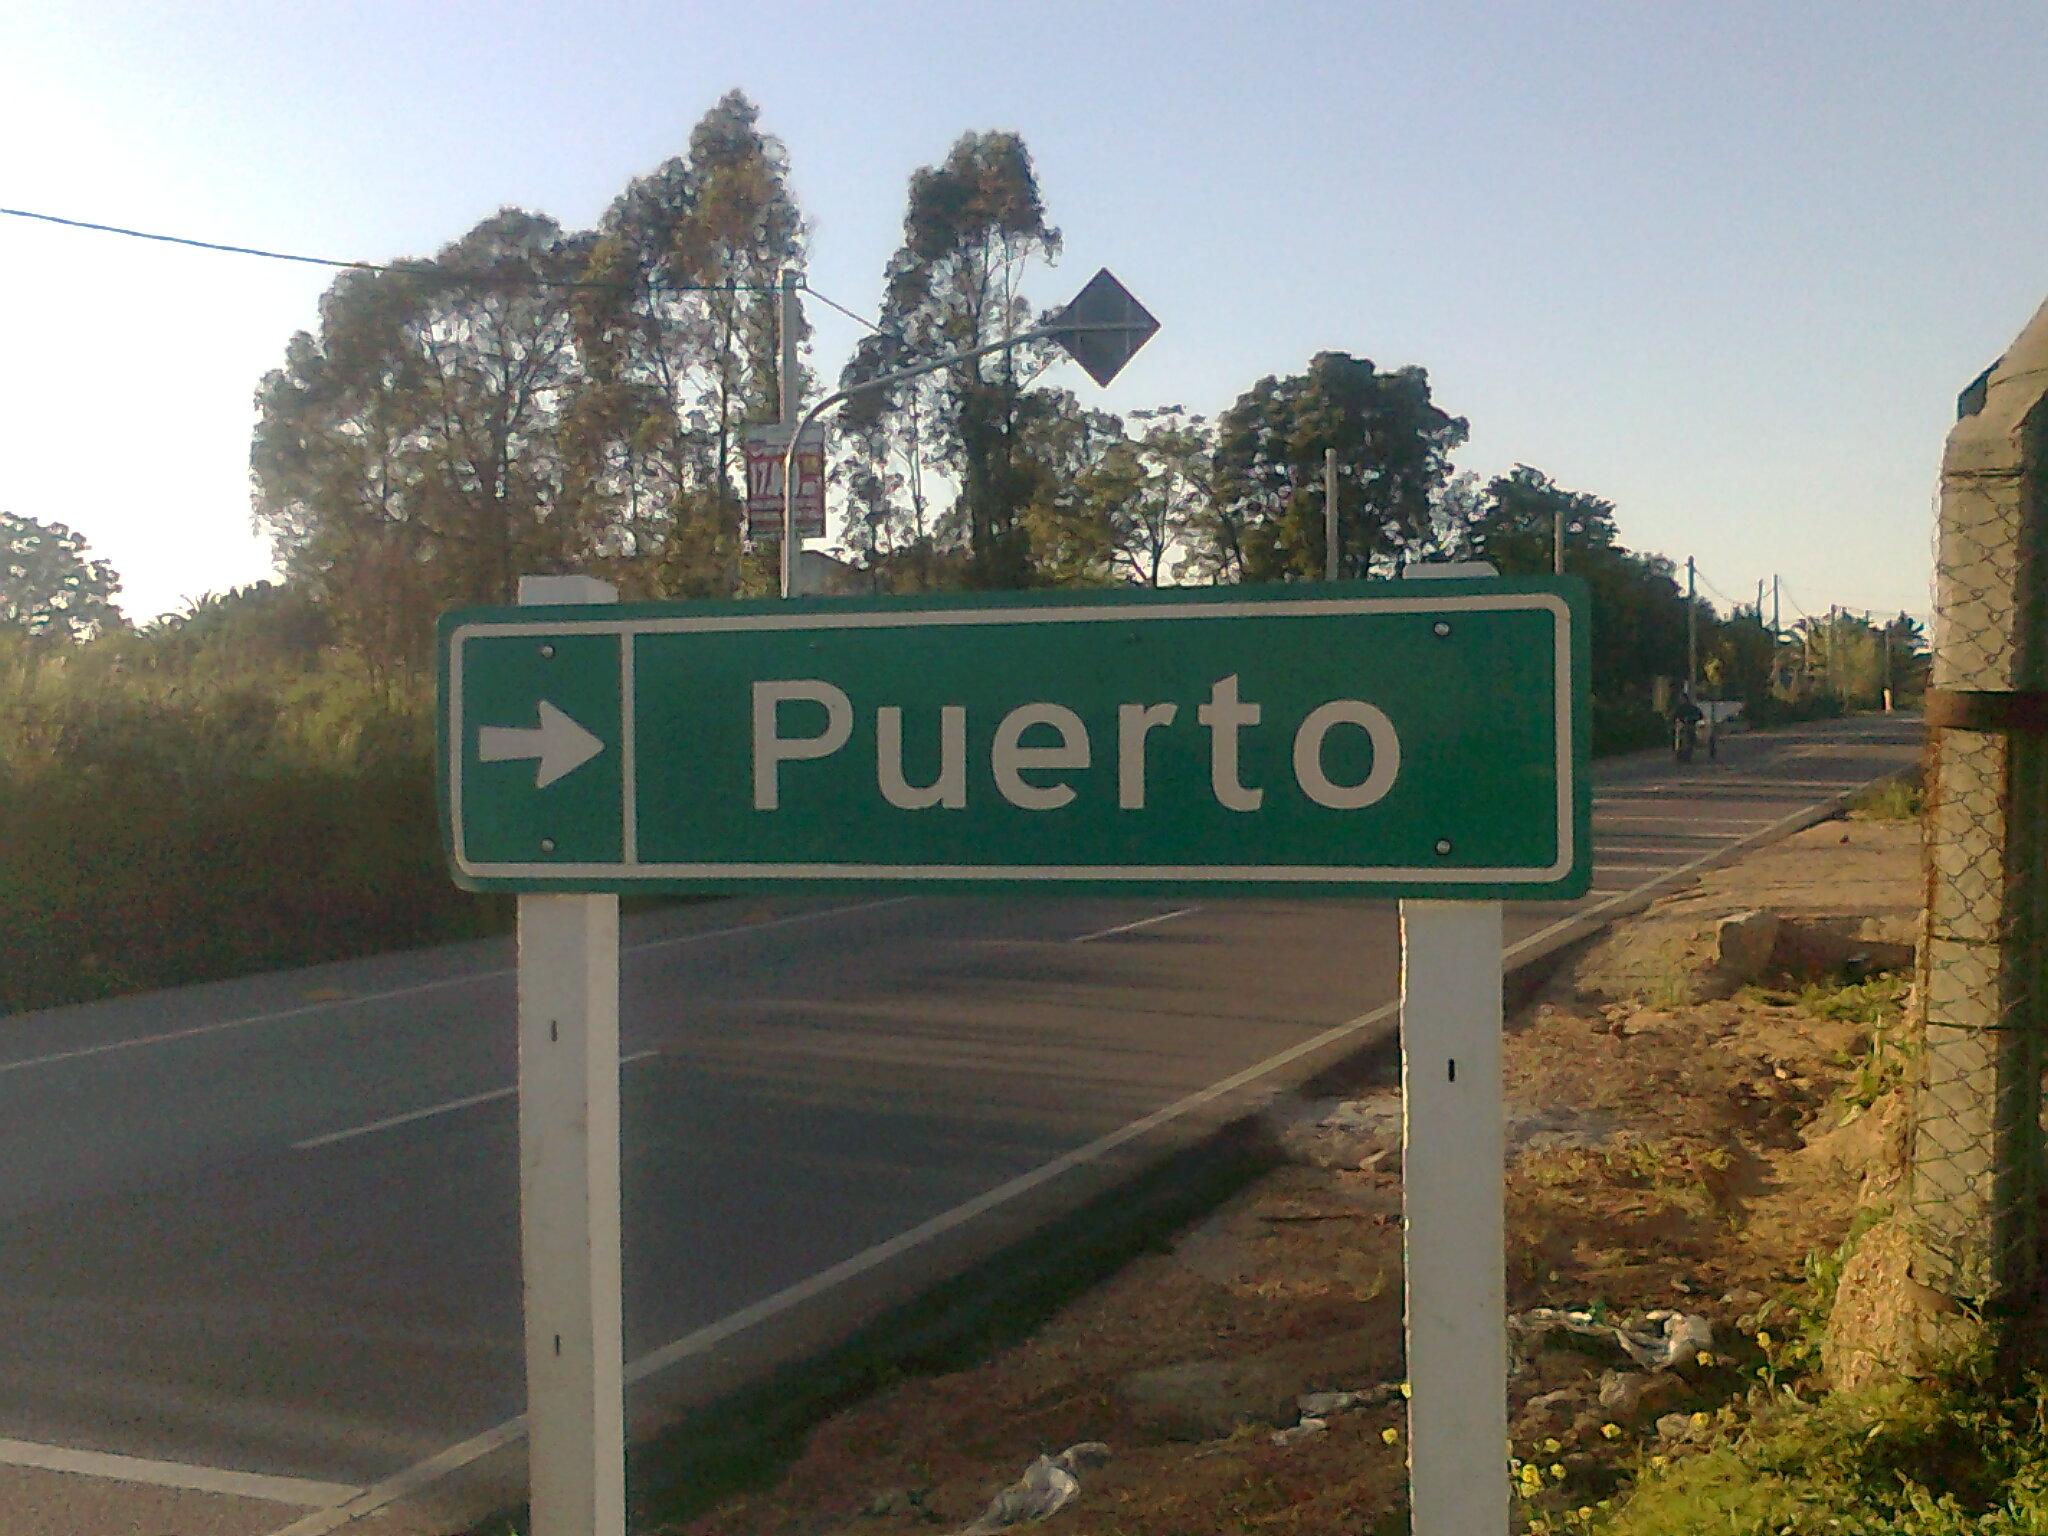 9 Cartel de Puerto inexistente